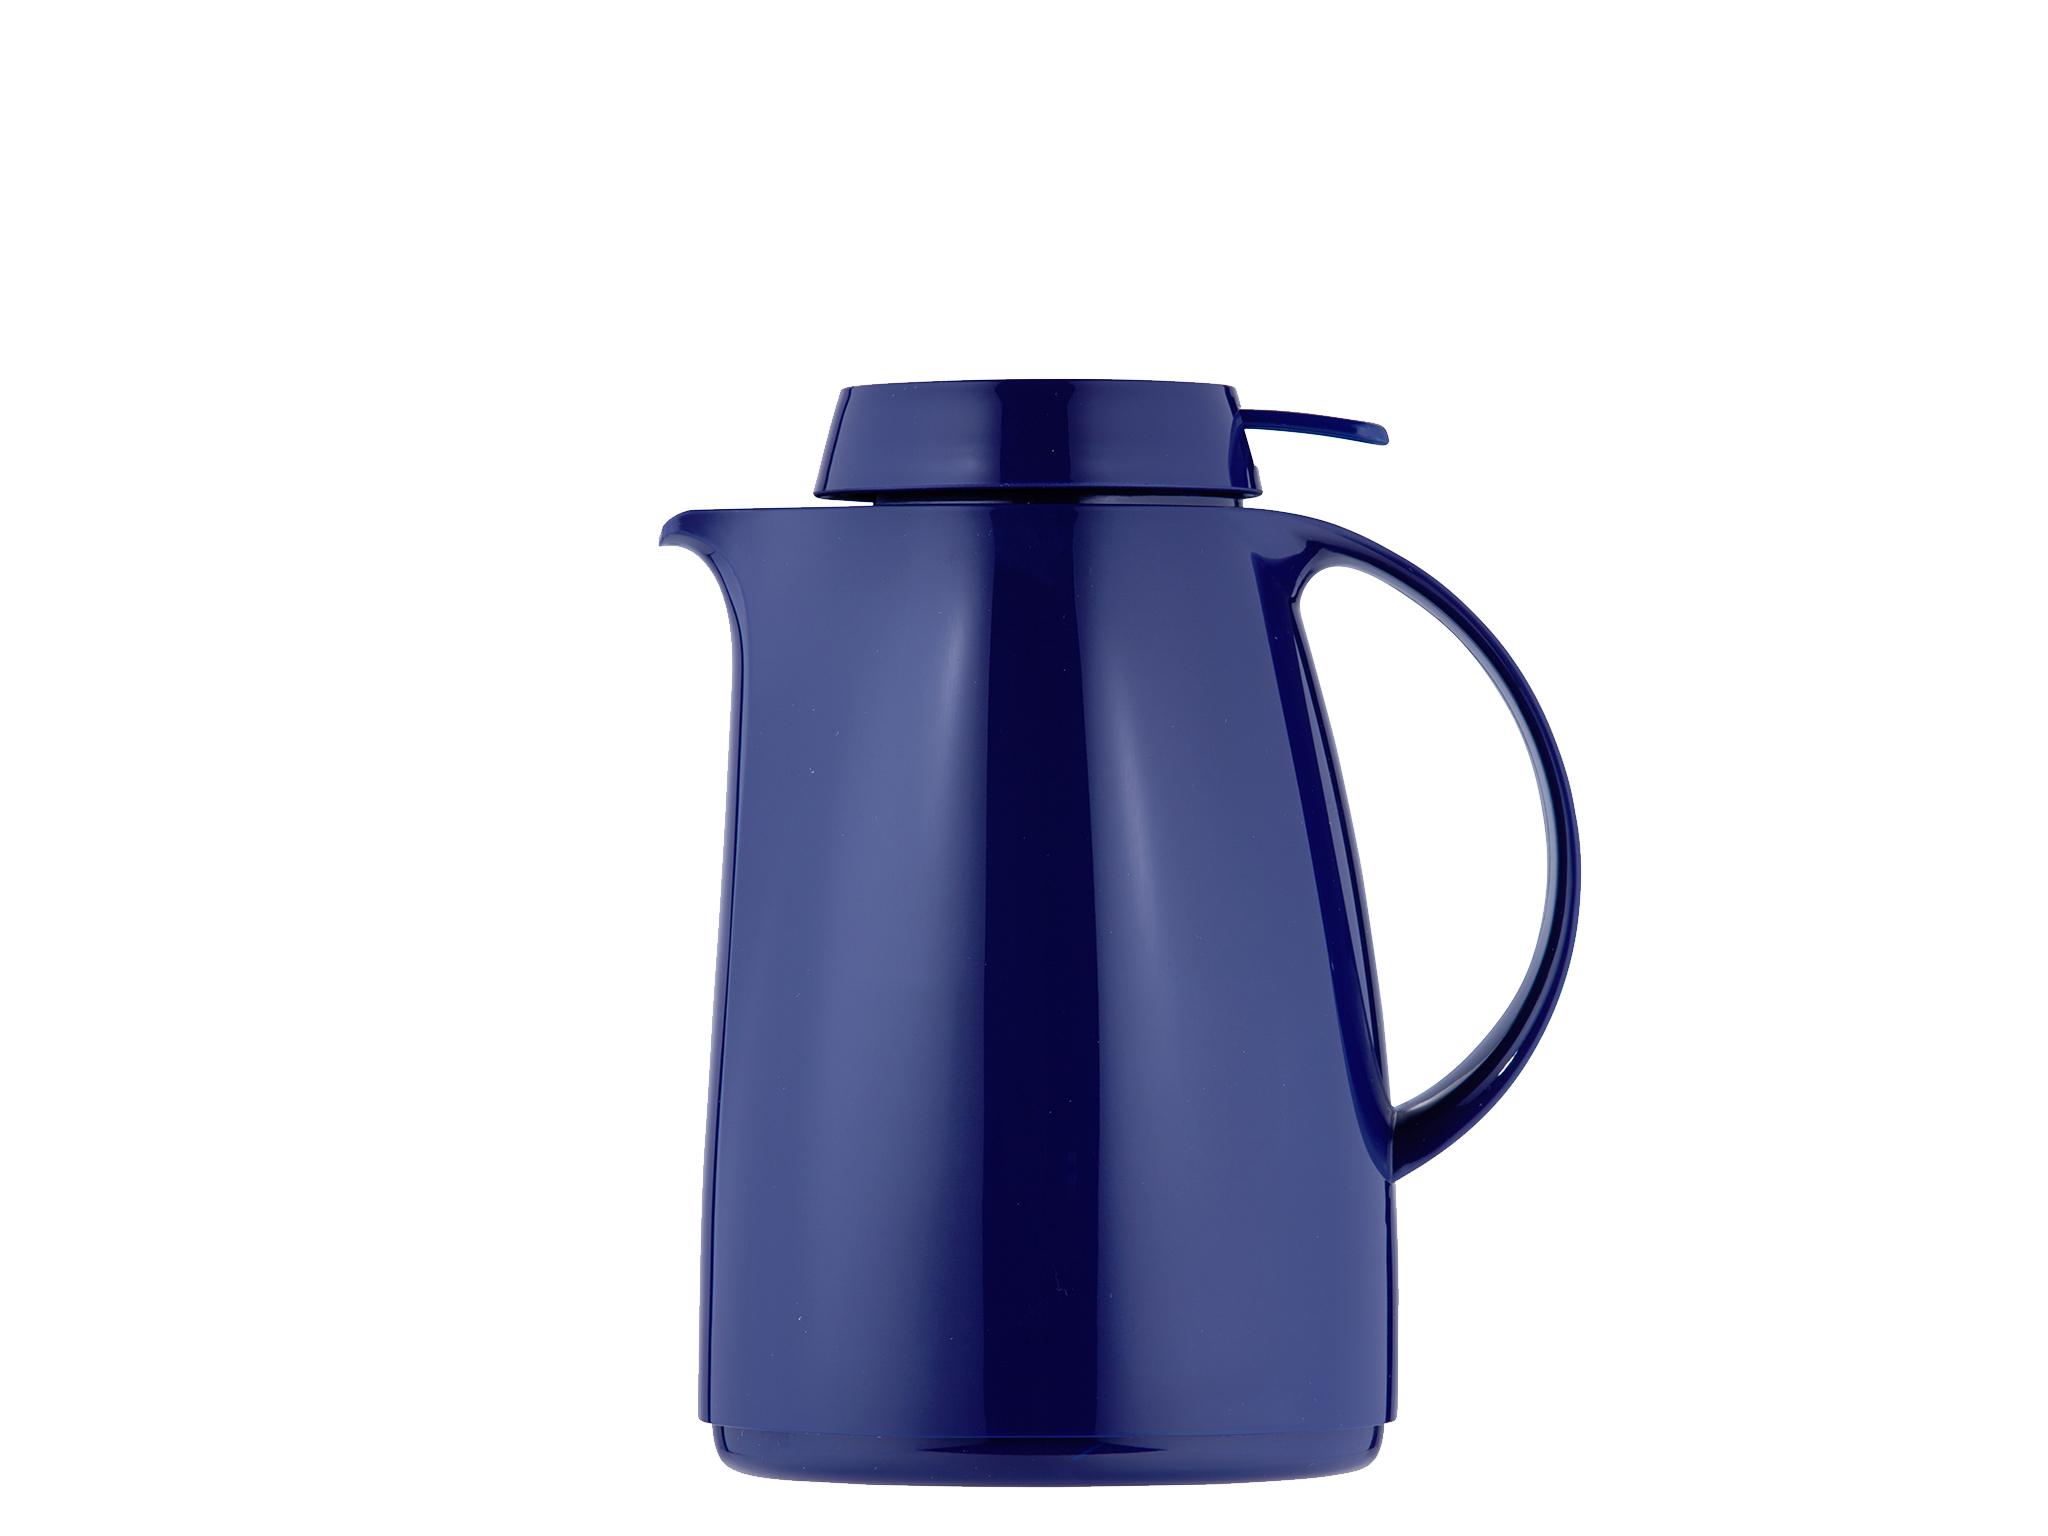 7204-008 - Vacuum carafe blue 1.0 L SERVITHERM - Helios